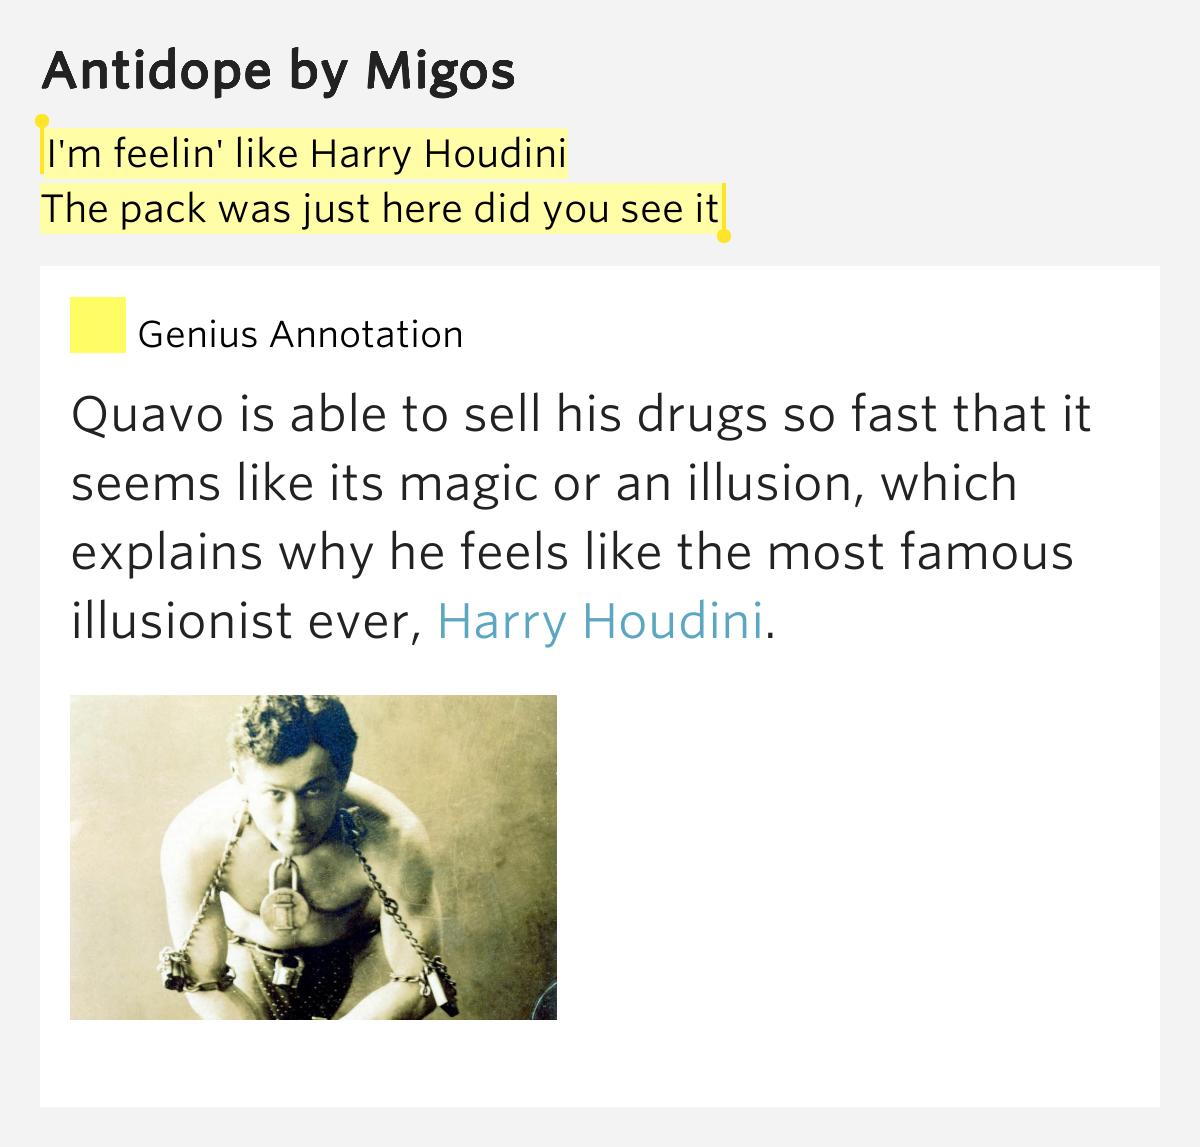 Migos – Antidope Lyrics | Genius Lyrics